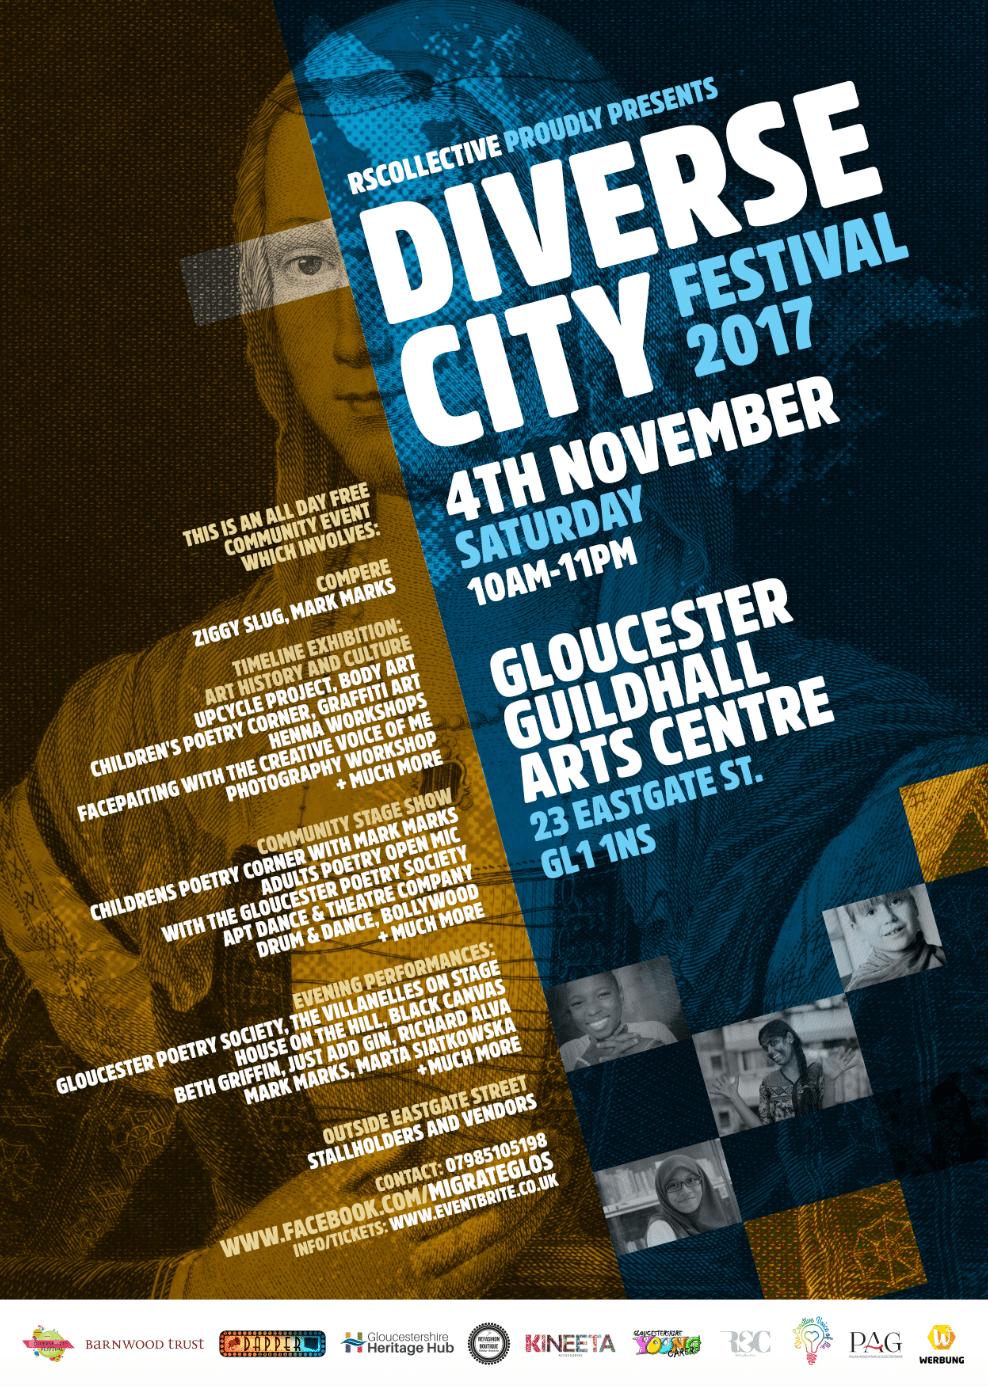 DIVERSE-CITY FESTIVAL 2017 | Blacknet UK